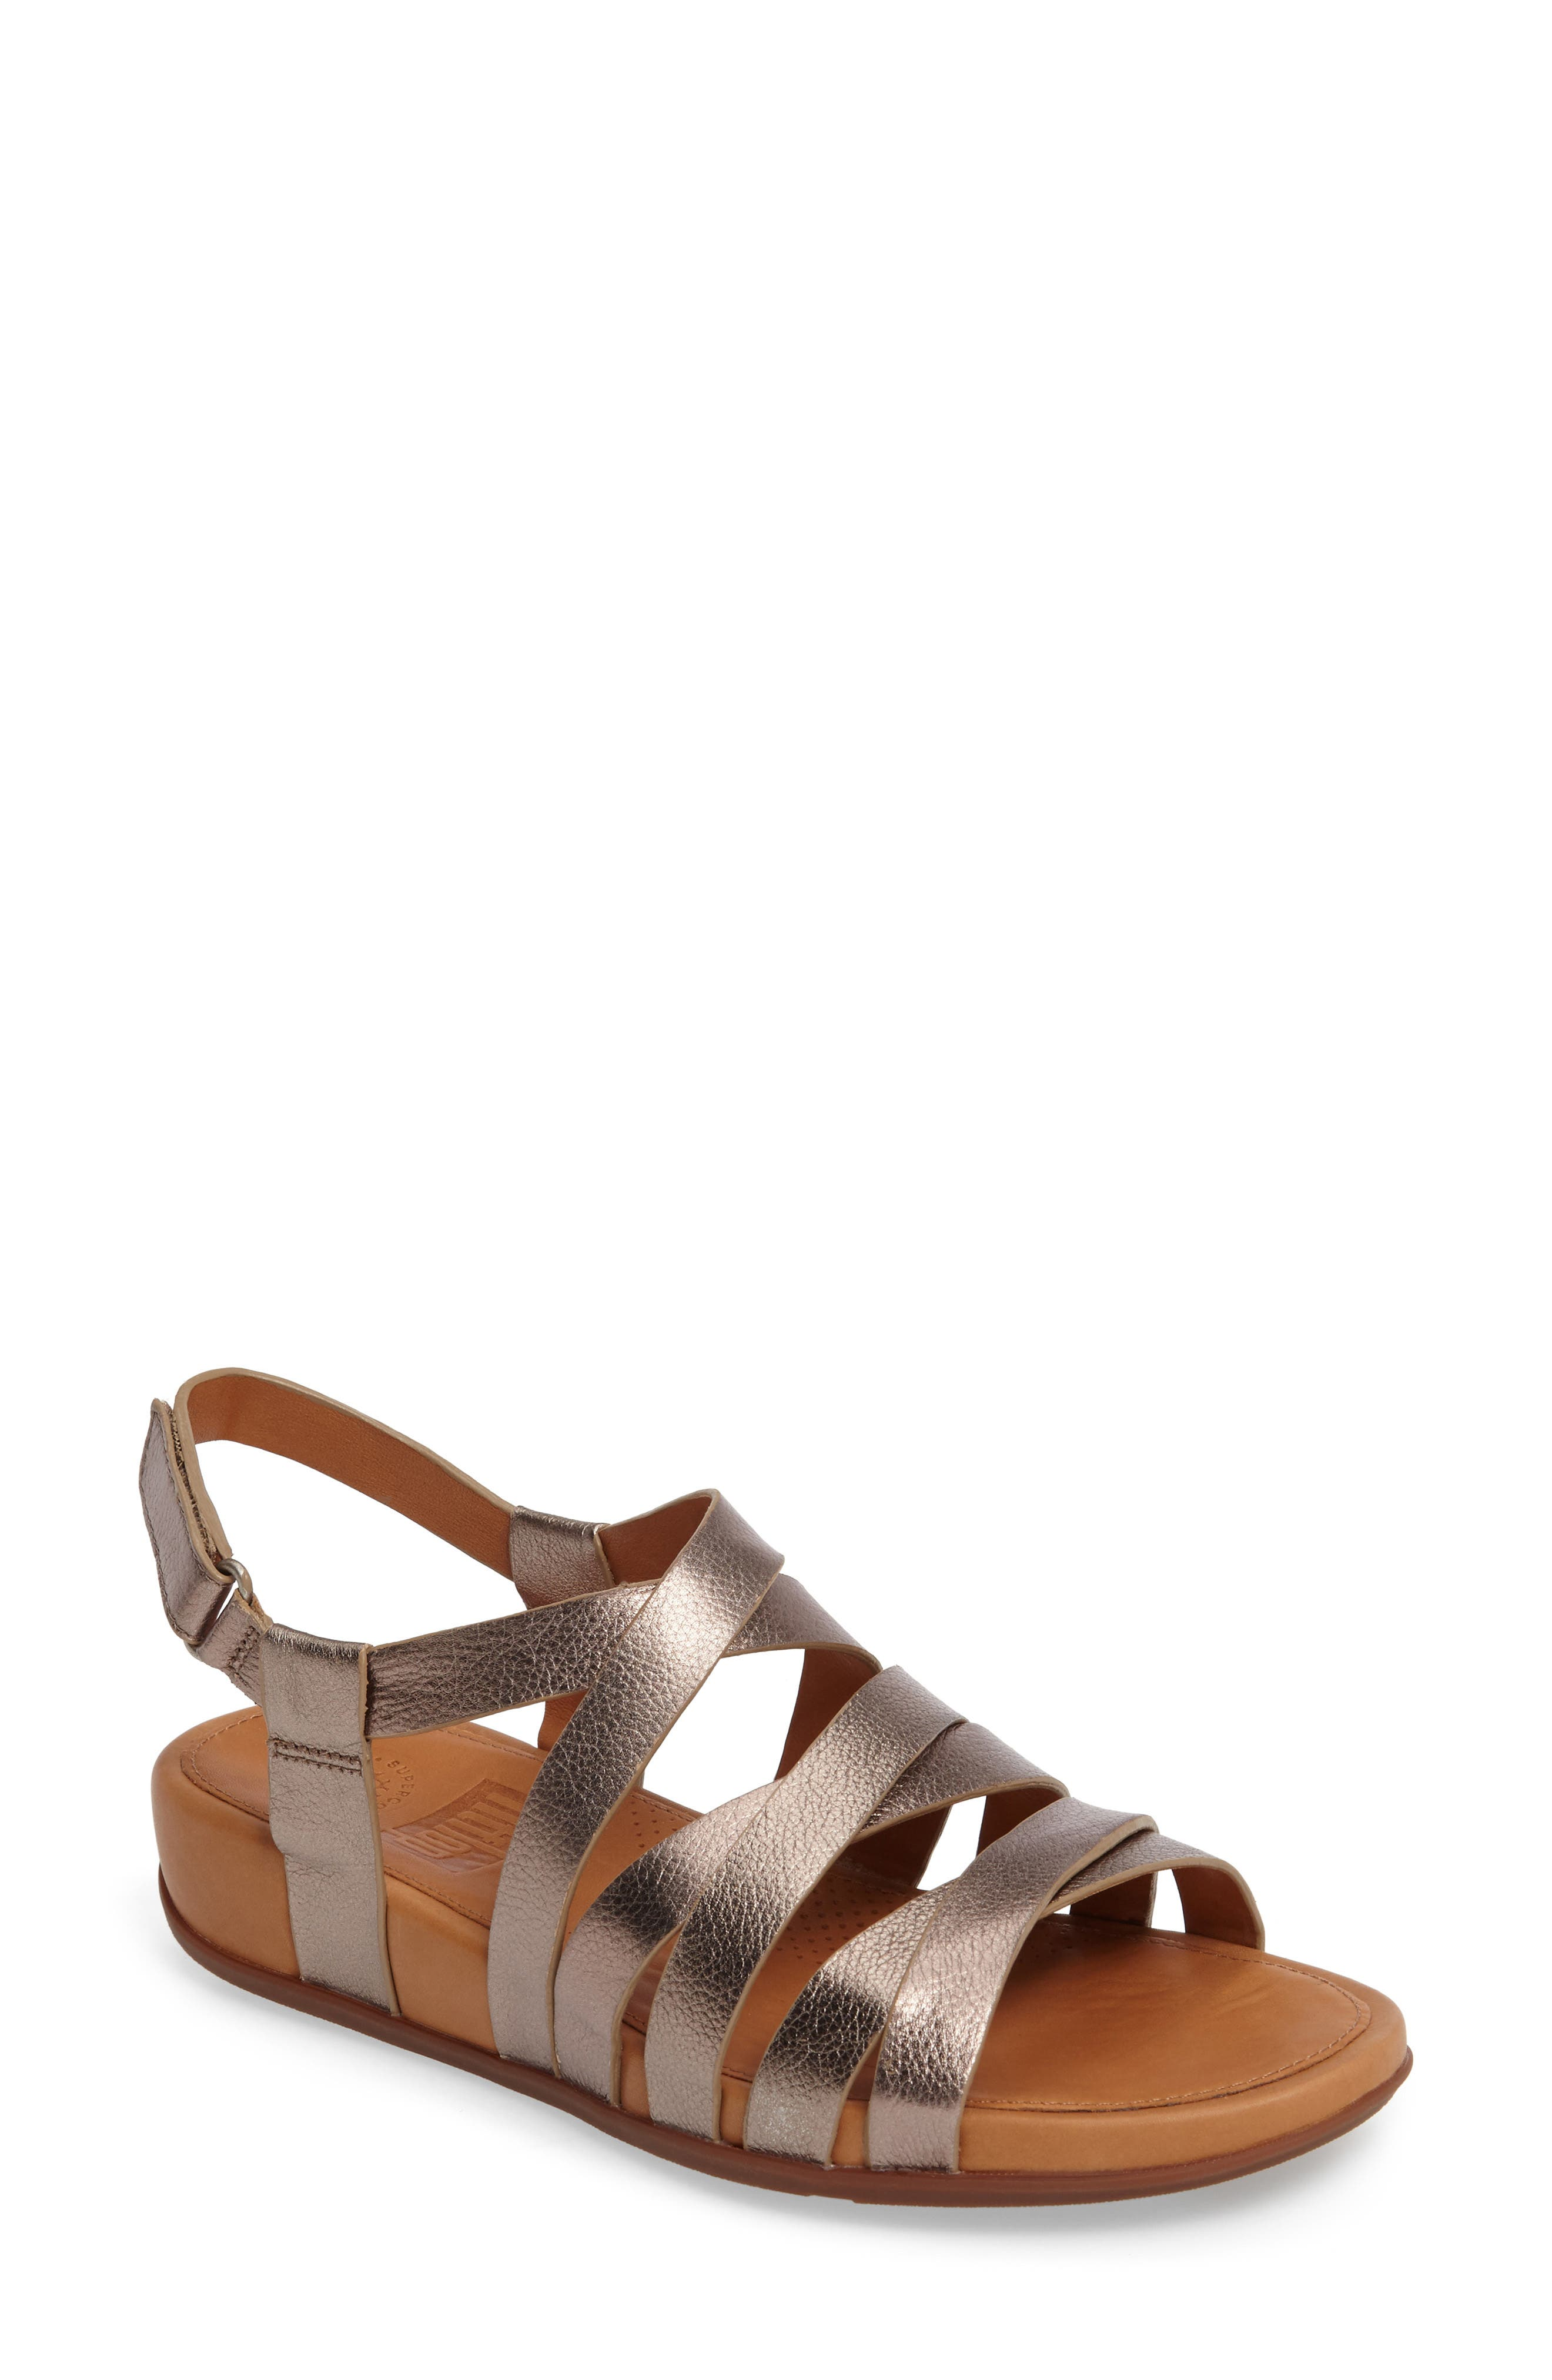 FITFLOP Lumy Gladiator Sandal